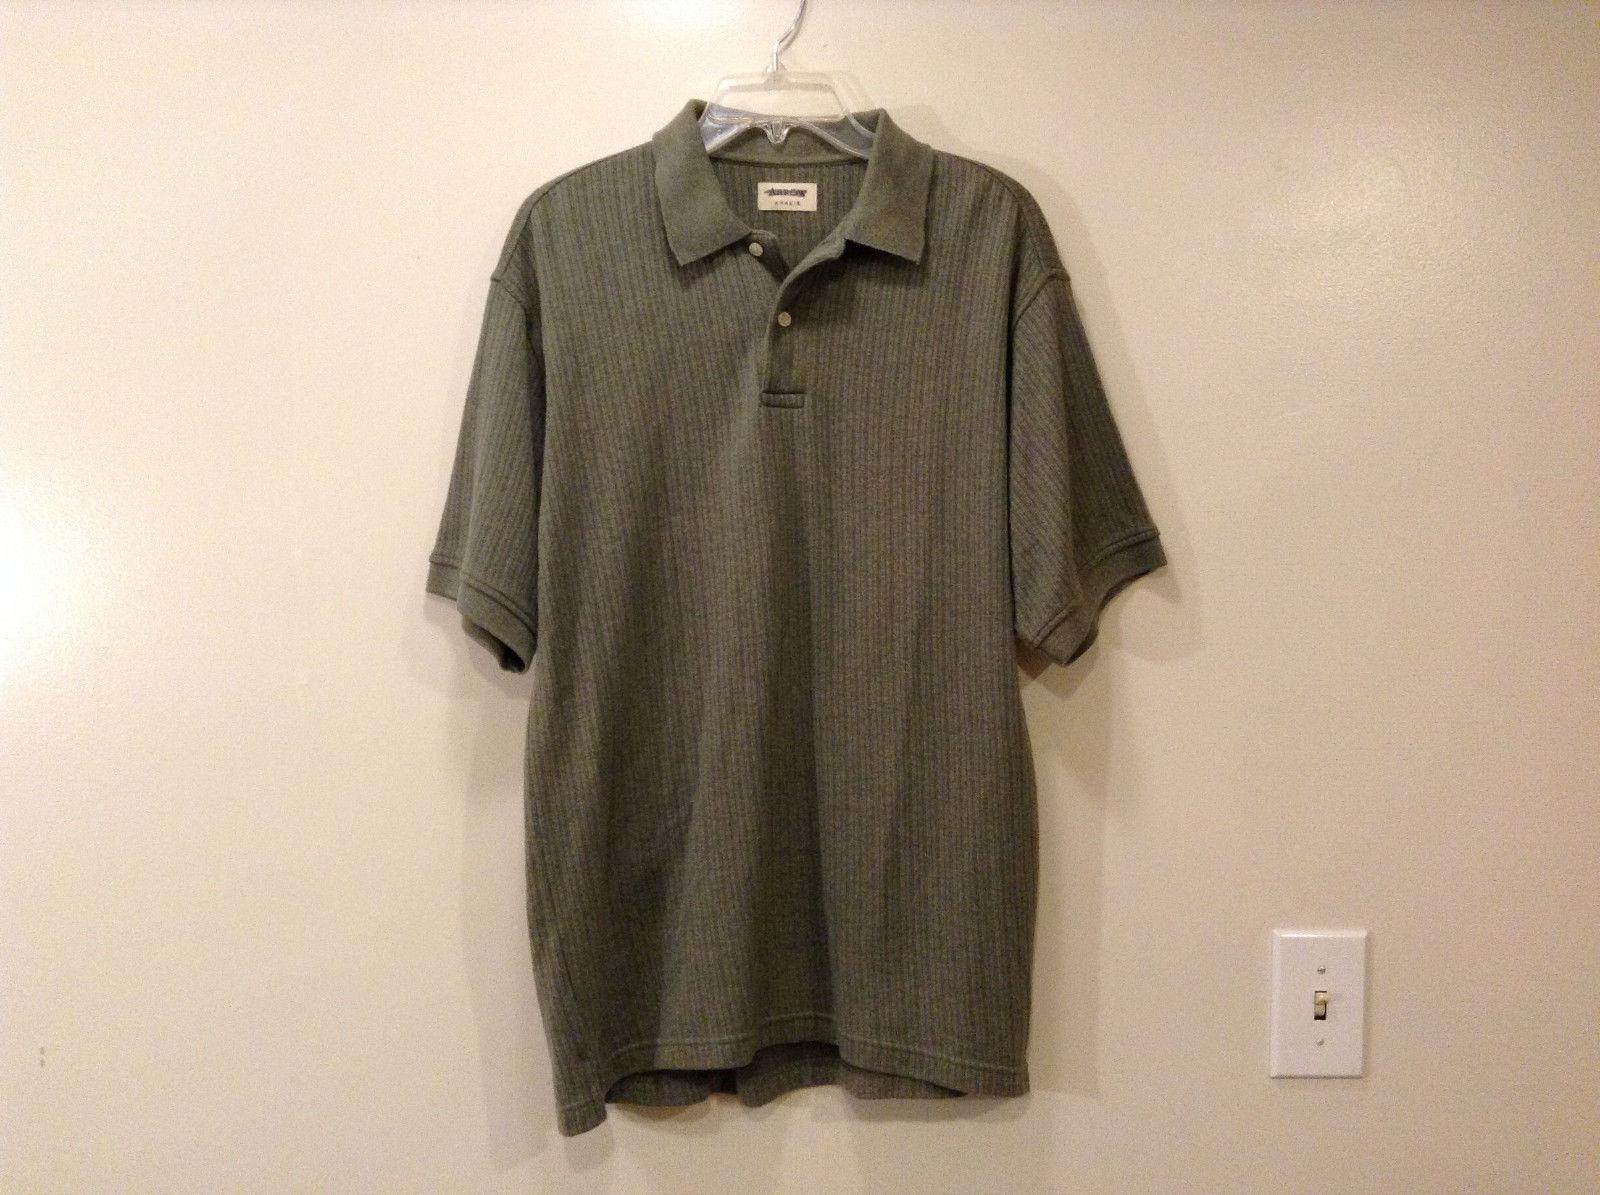 Arrow Khakis Men's Size M Polo Shirt Heather Dusty Olive Khaki Gray Ribbed Knit